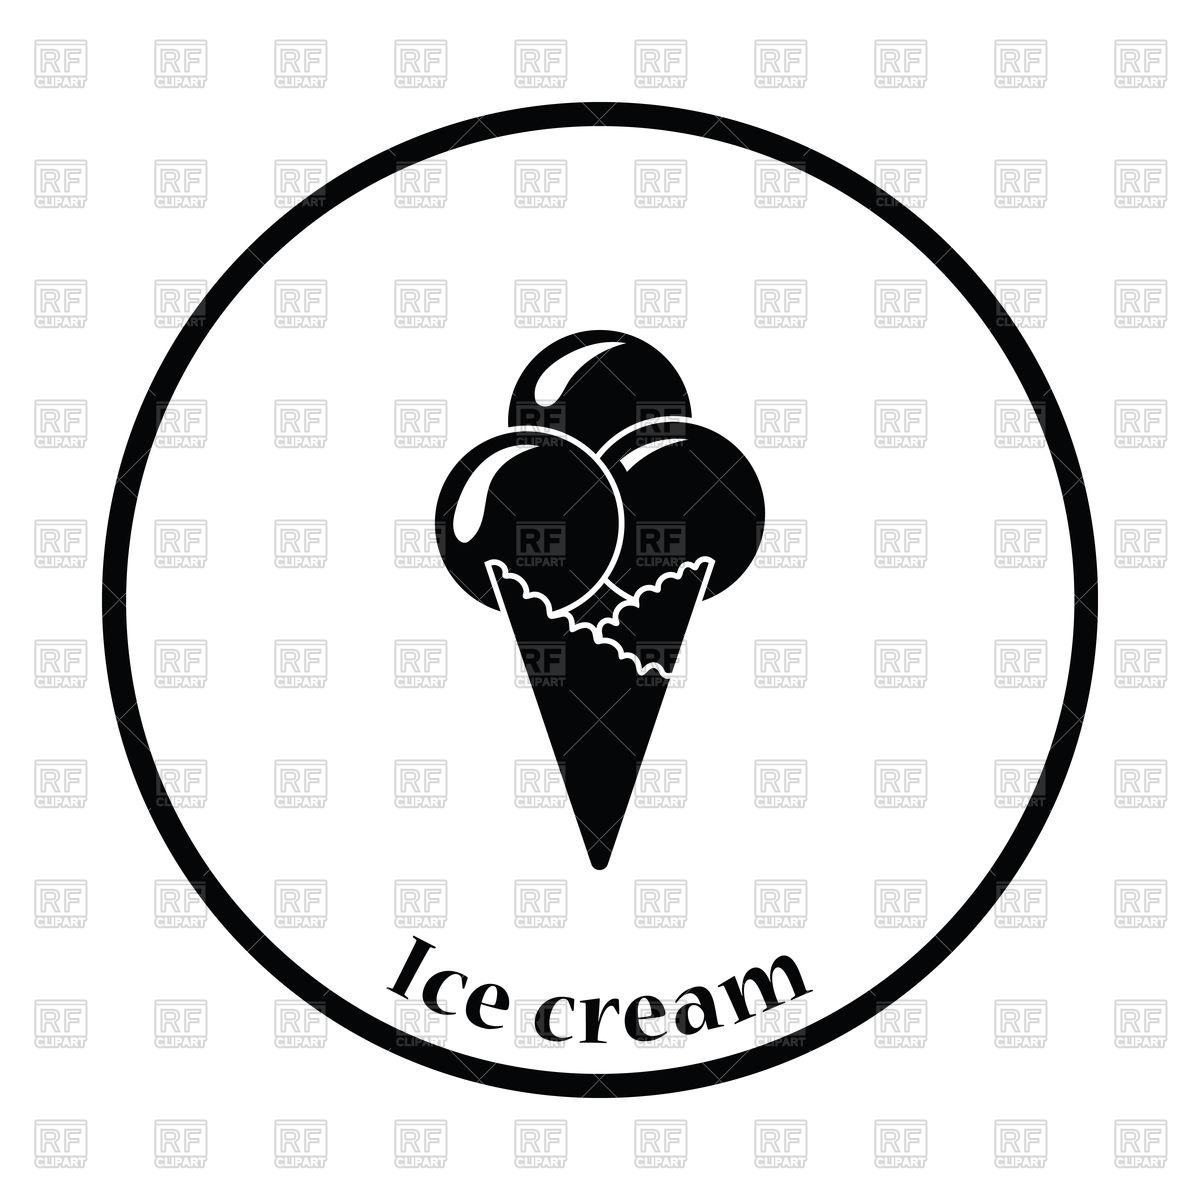 1200x1200 Silhouette Of Ice Cream Cone Royalty Free Vector Clip Art Image